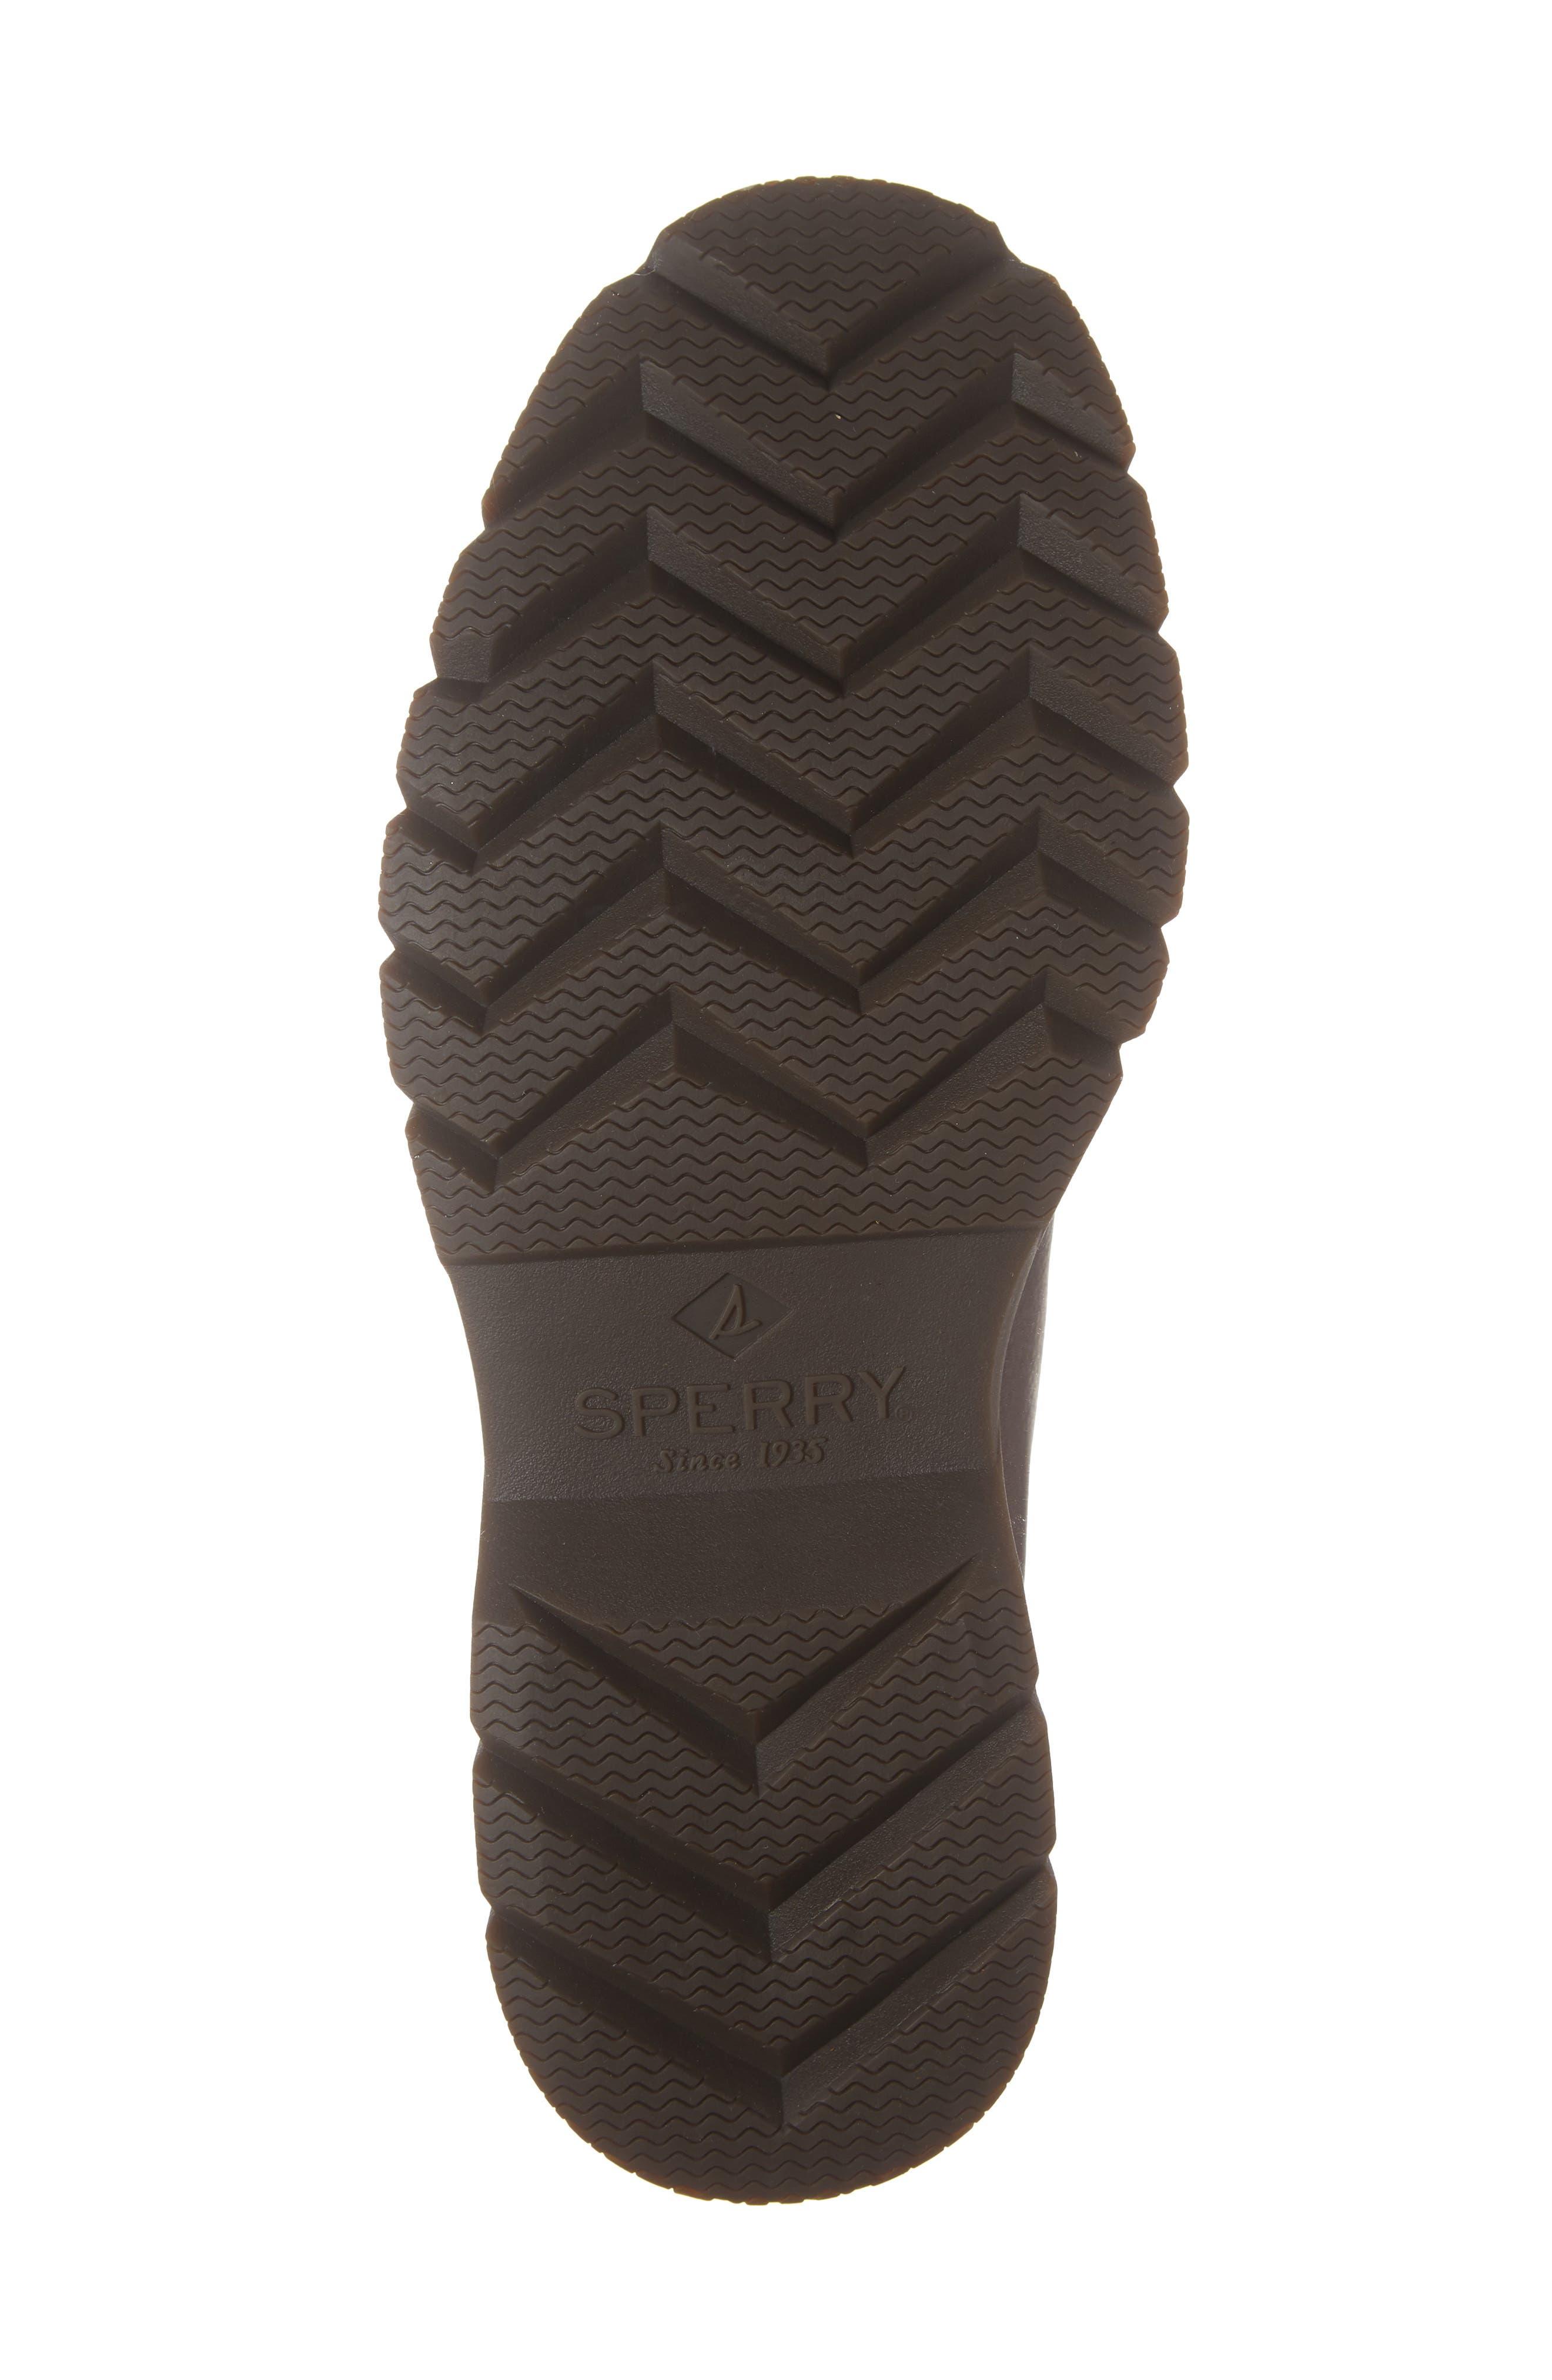 SPERRY, Watertown Waterproof Plain Toe Boot, Alternate thumbnail 6, color, DARK BROWN